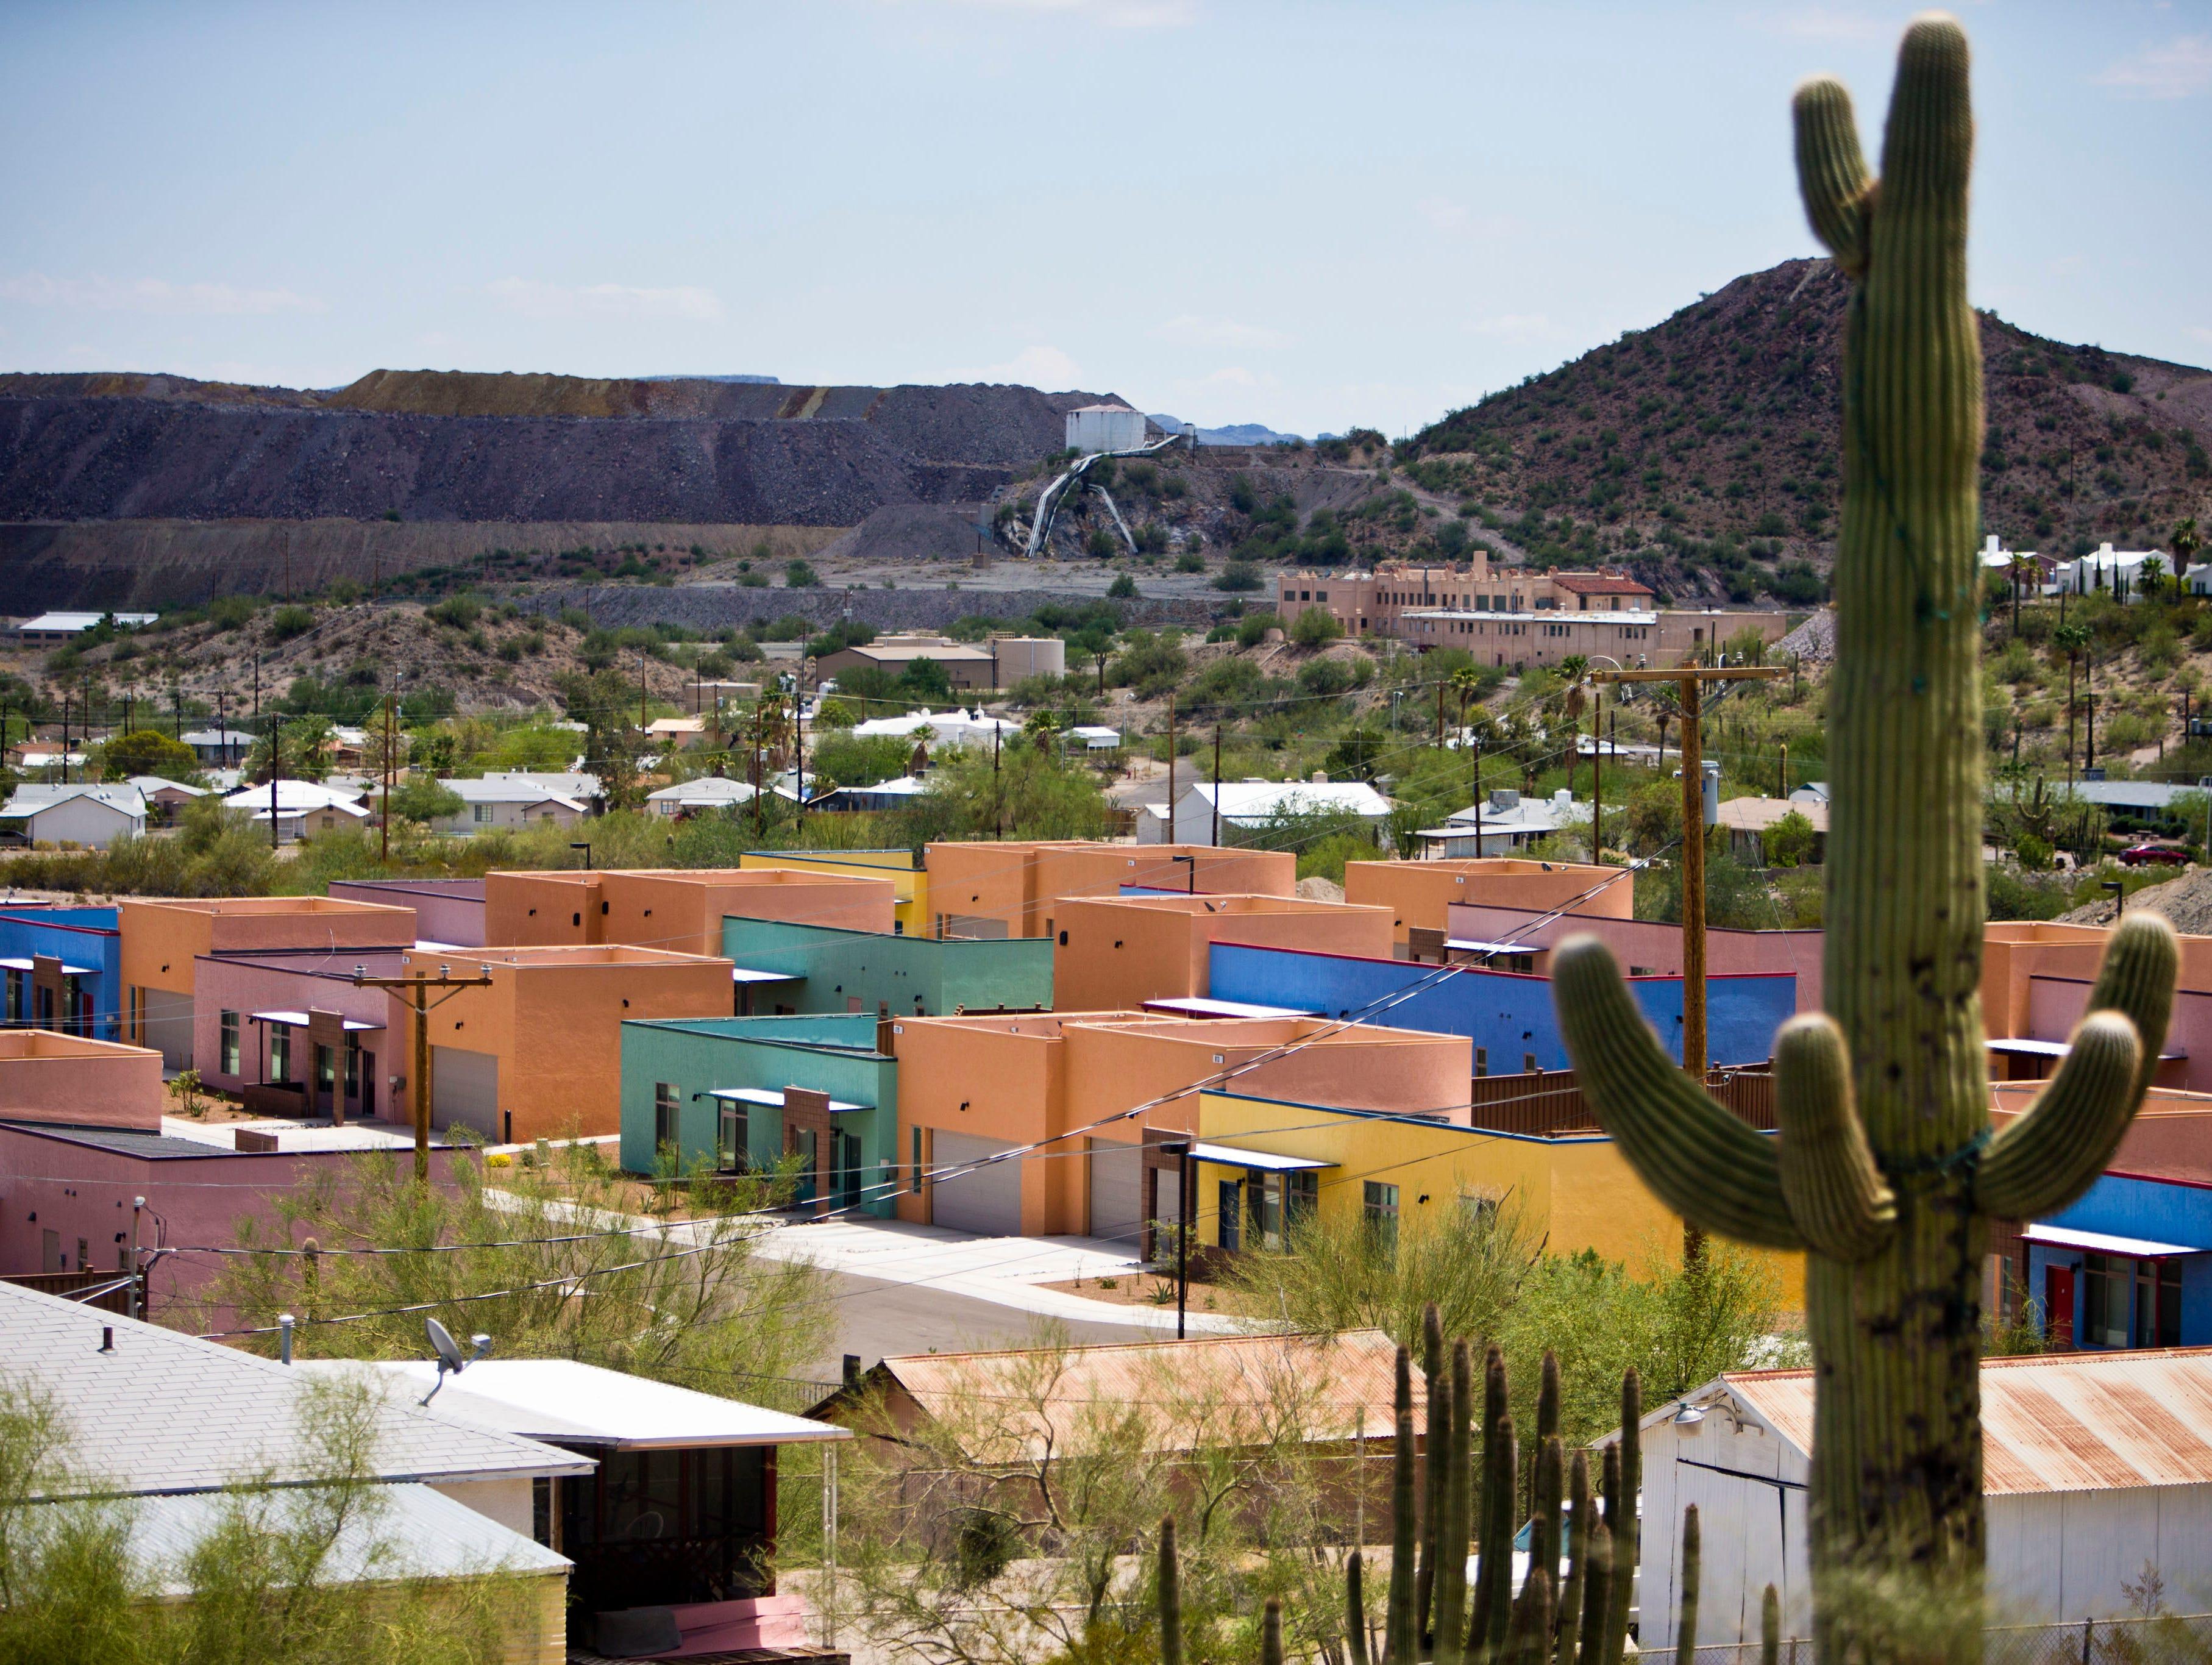 080913 immig border patrol housing